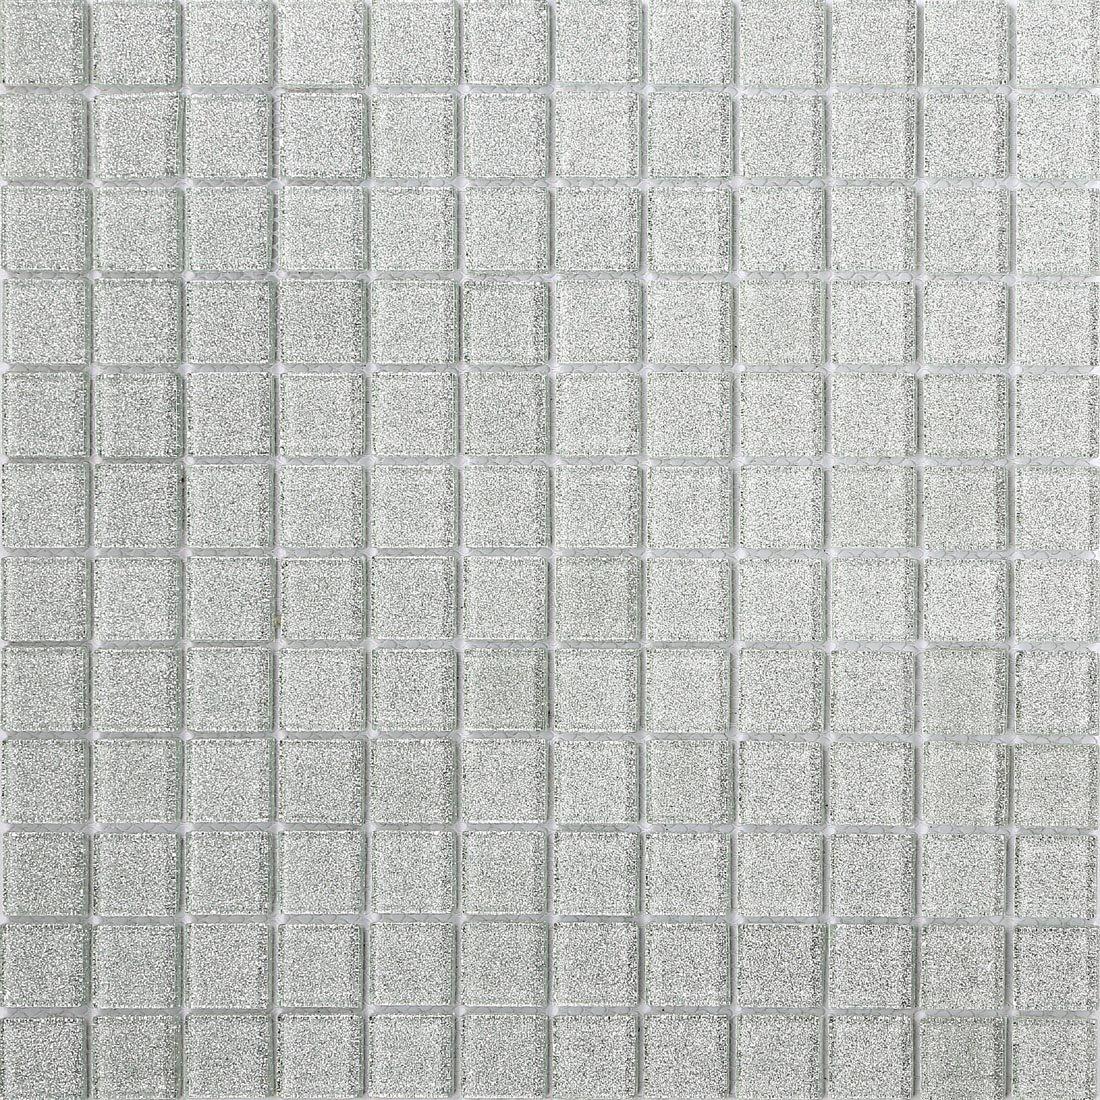 30cm x 30cm Glitter Silver Glass Mosaic Tiles Sheet (MT0073) Grand Taps